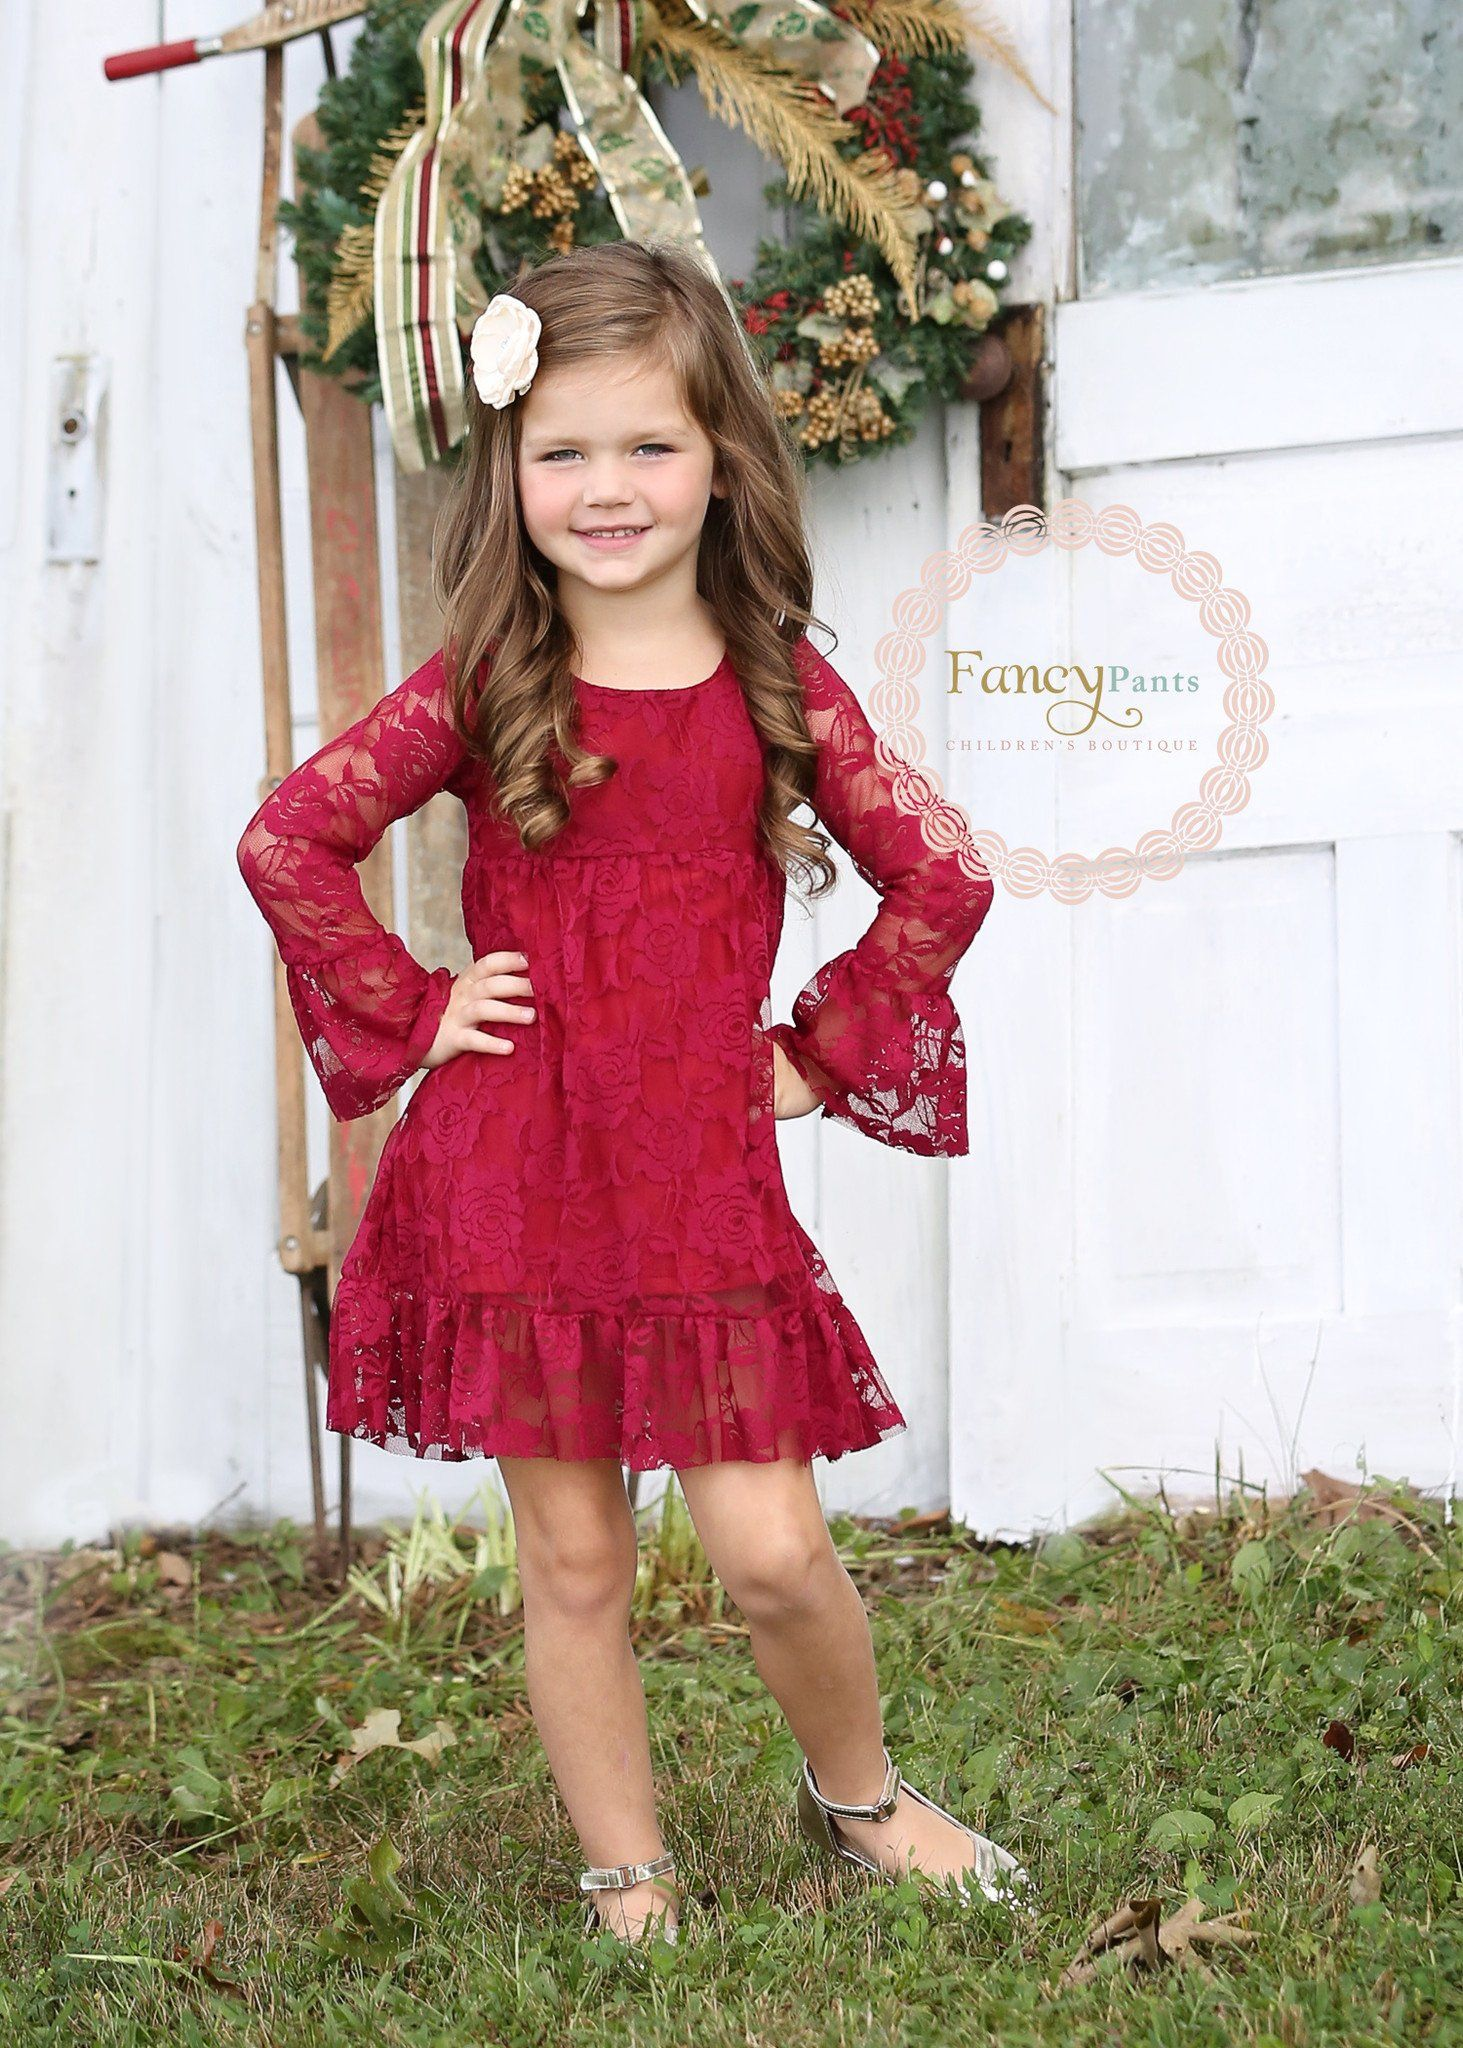 Rustic wedding flower girl dresses  Burgundy Boho Chic Lace Dress  Vintage flower girl dresses Country